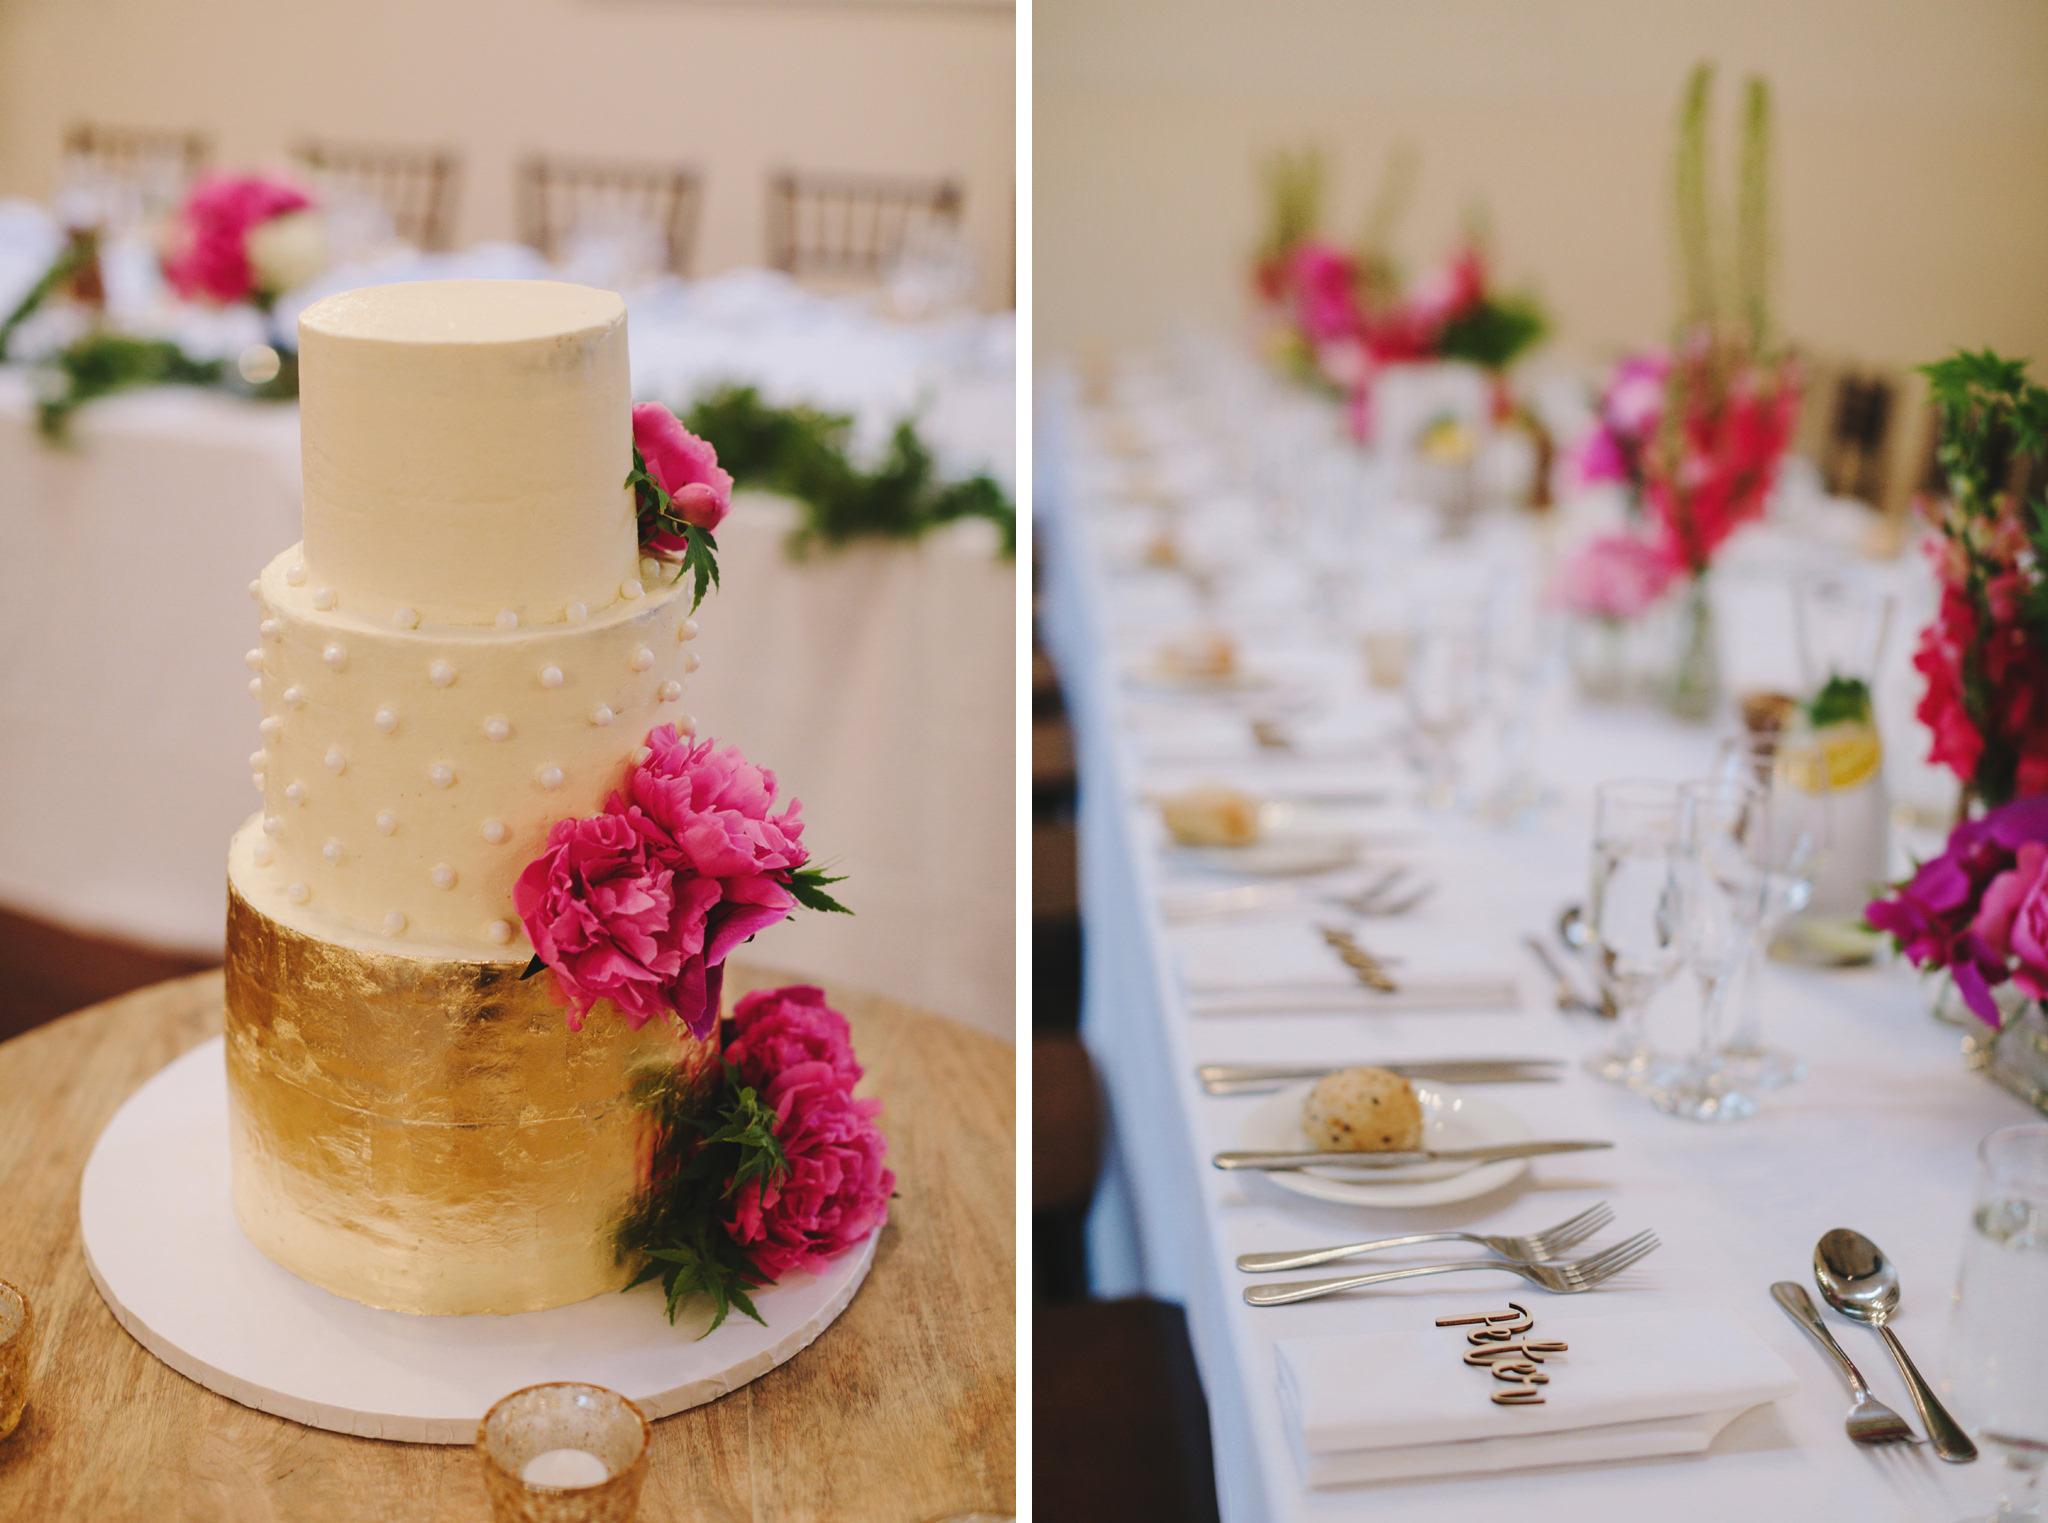 Abbotsford_Convent_Wedding_Peter_Anna092.JPG